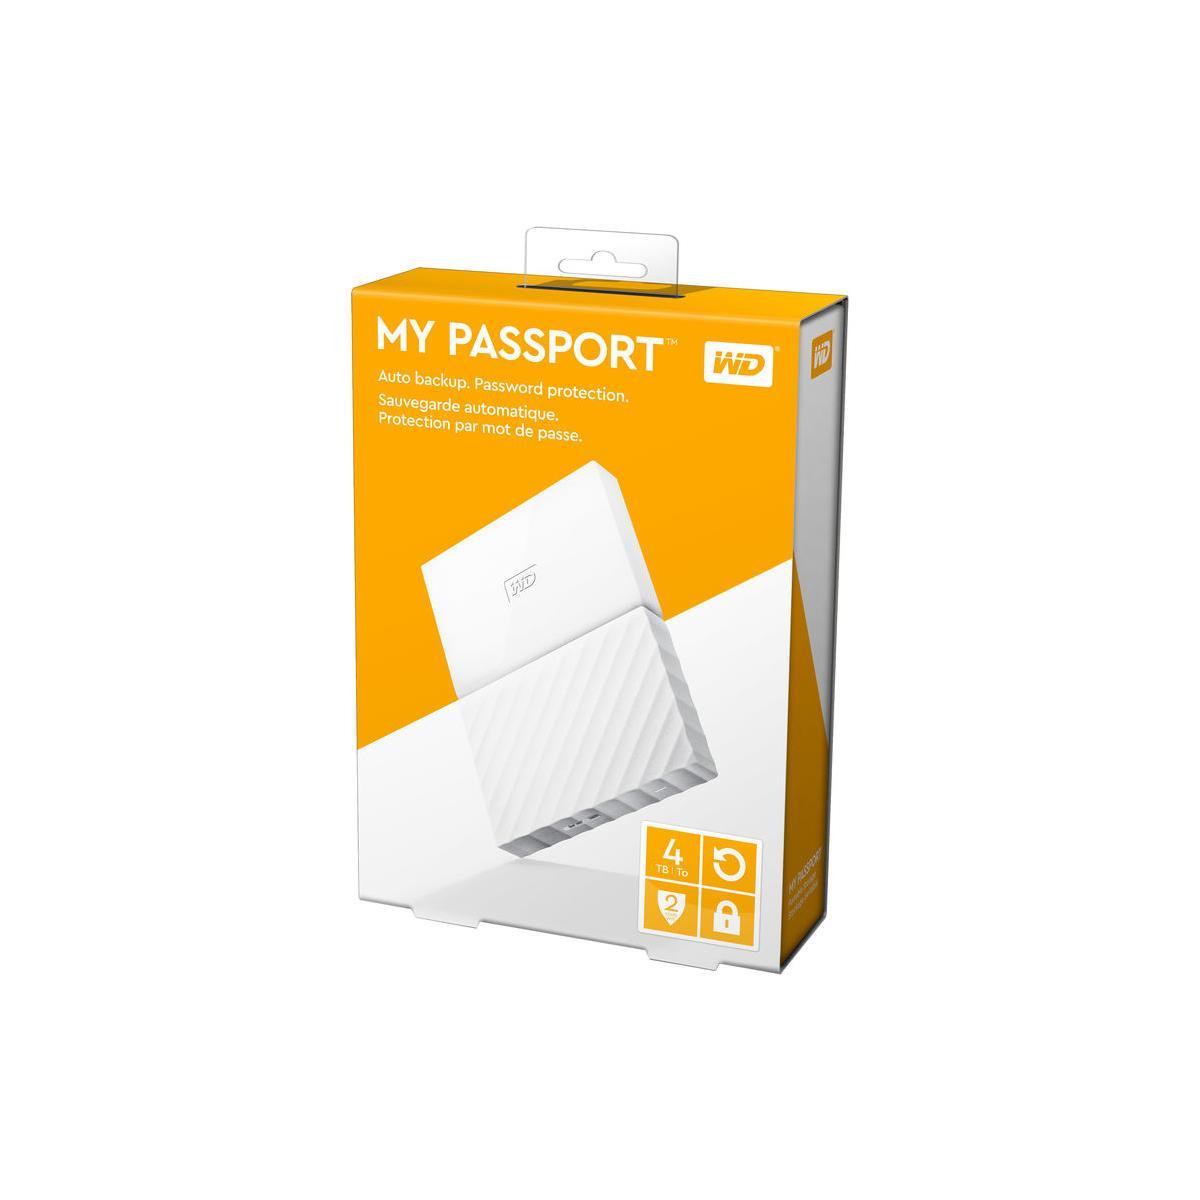 WD My Passport WDBYFT0040BWT-WESN 4 TB External Hard Drive - USB 3.0 - Portable - White - 256-bit Encryption Standard 2